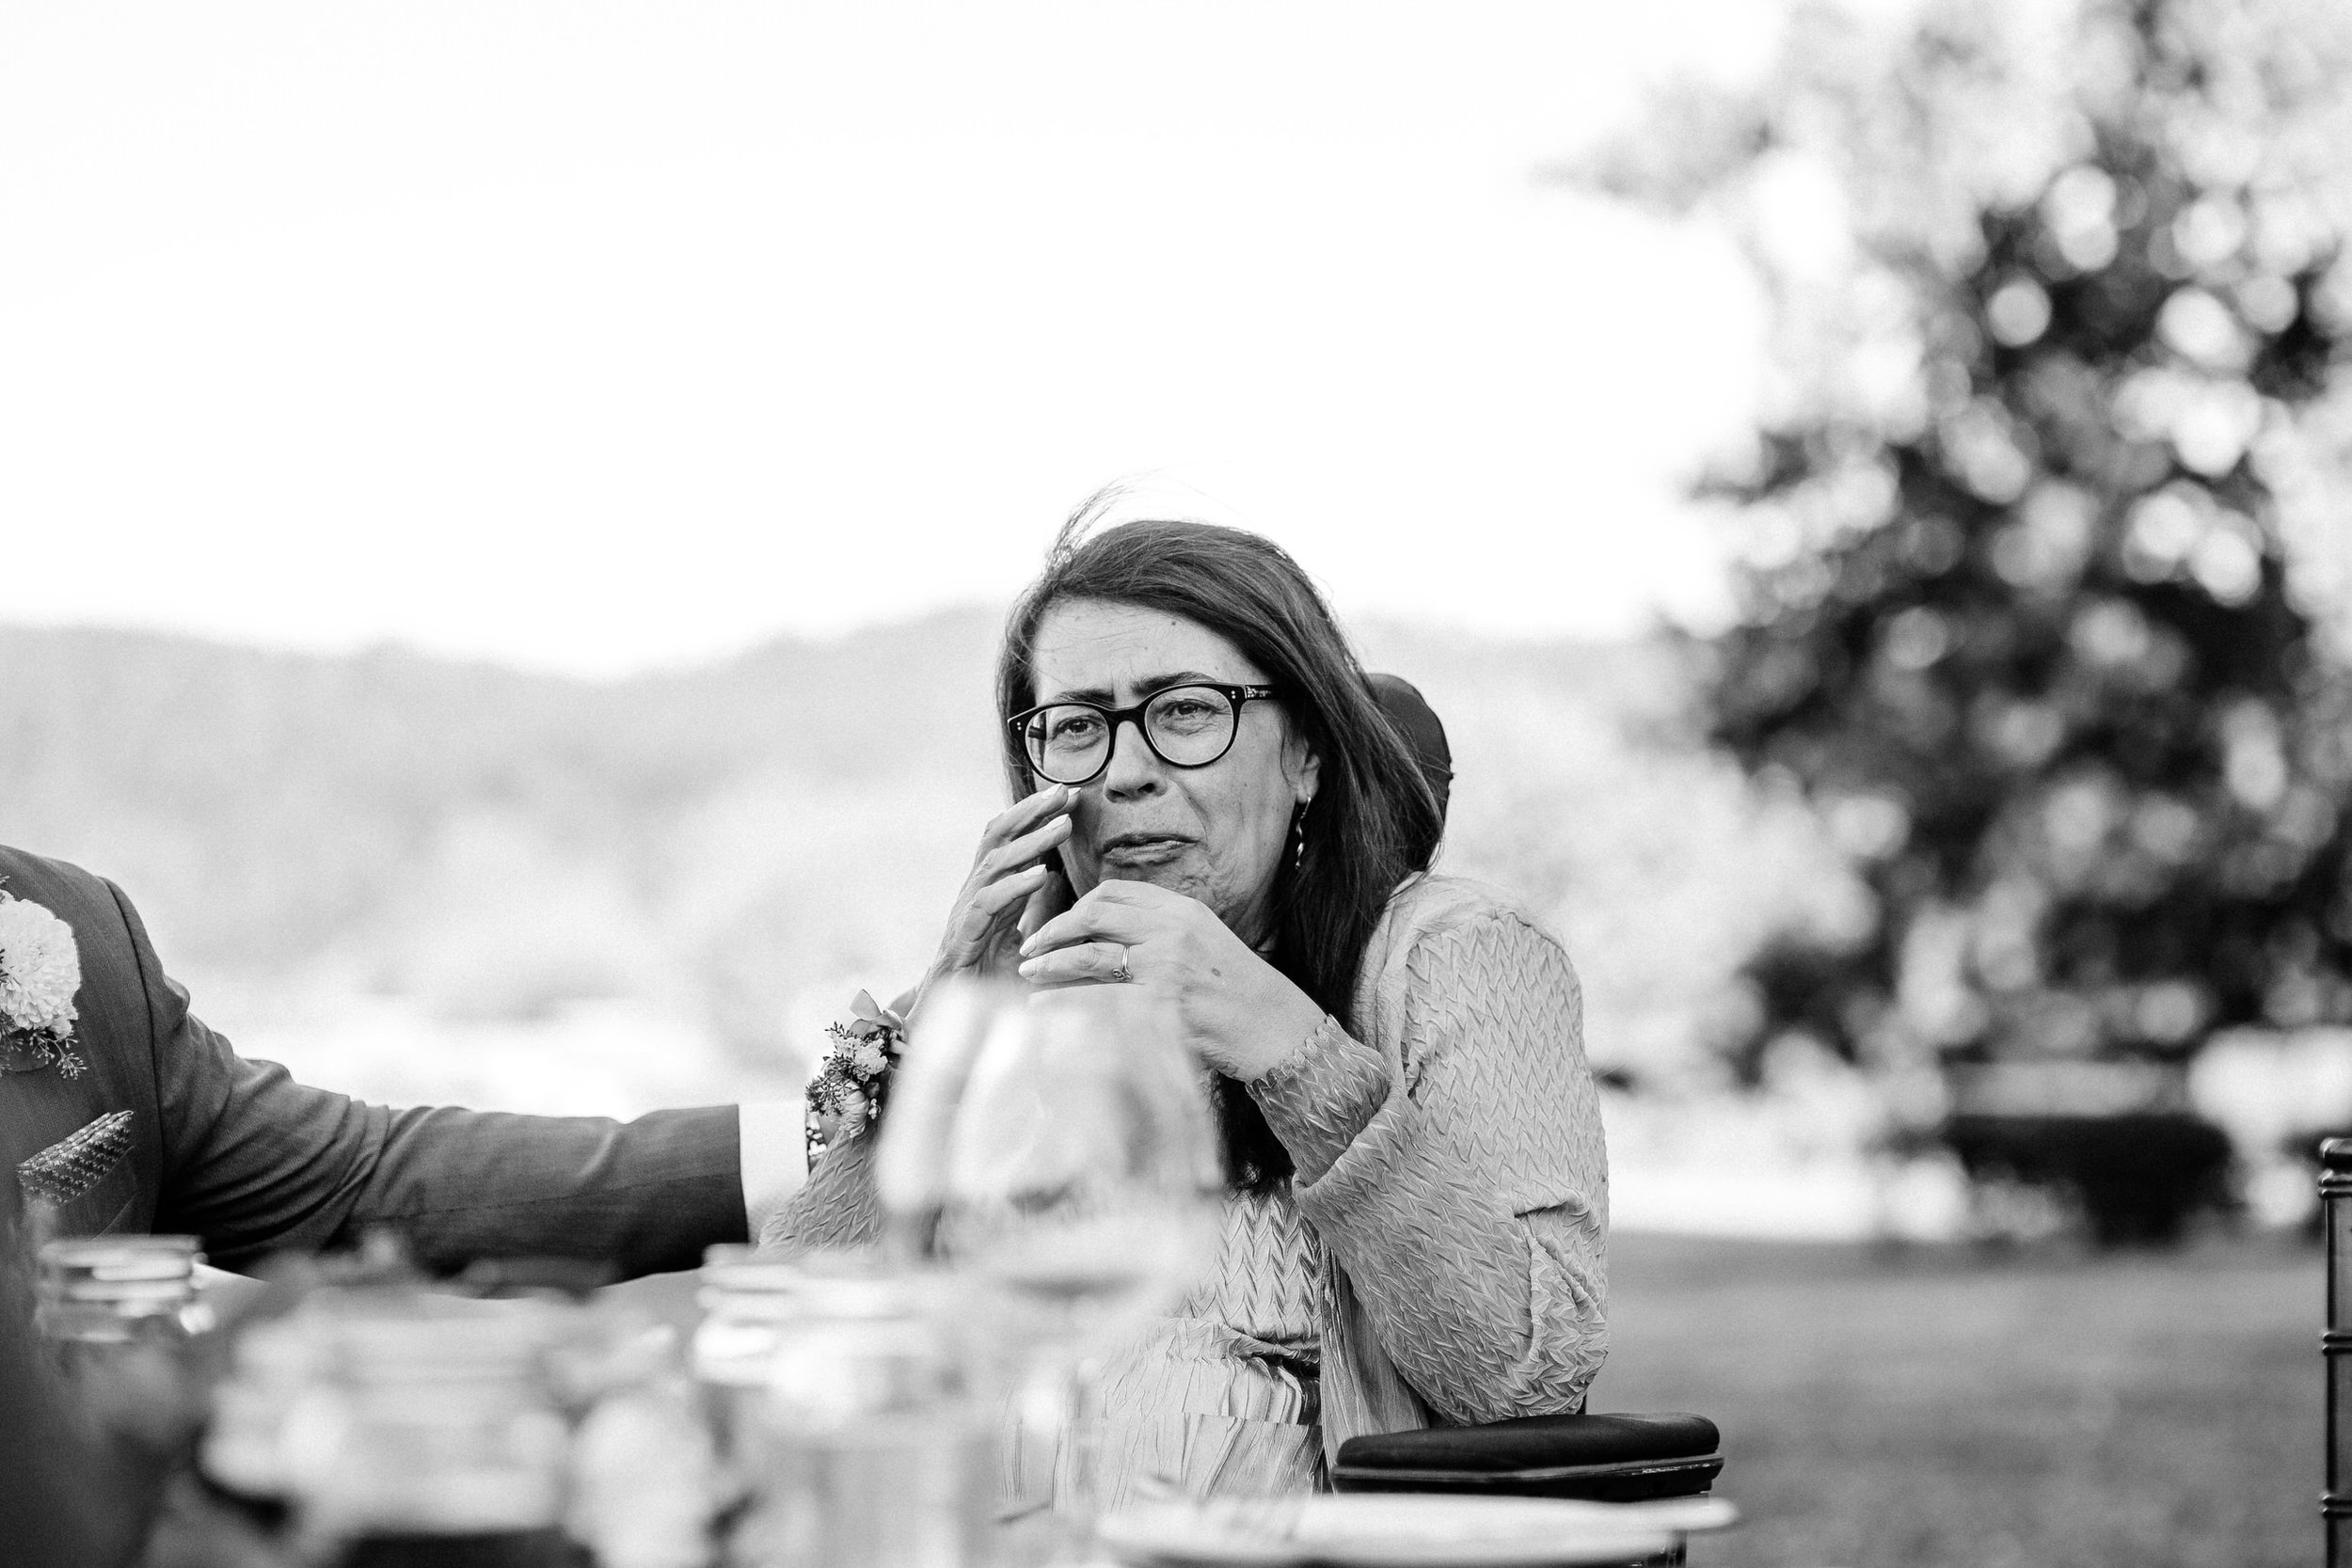 Beacon hill winery wedding photographer Oregon destination074.JPG